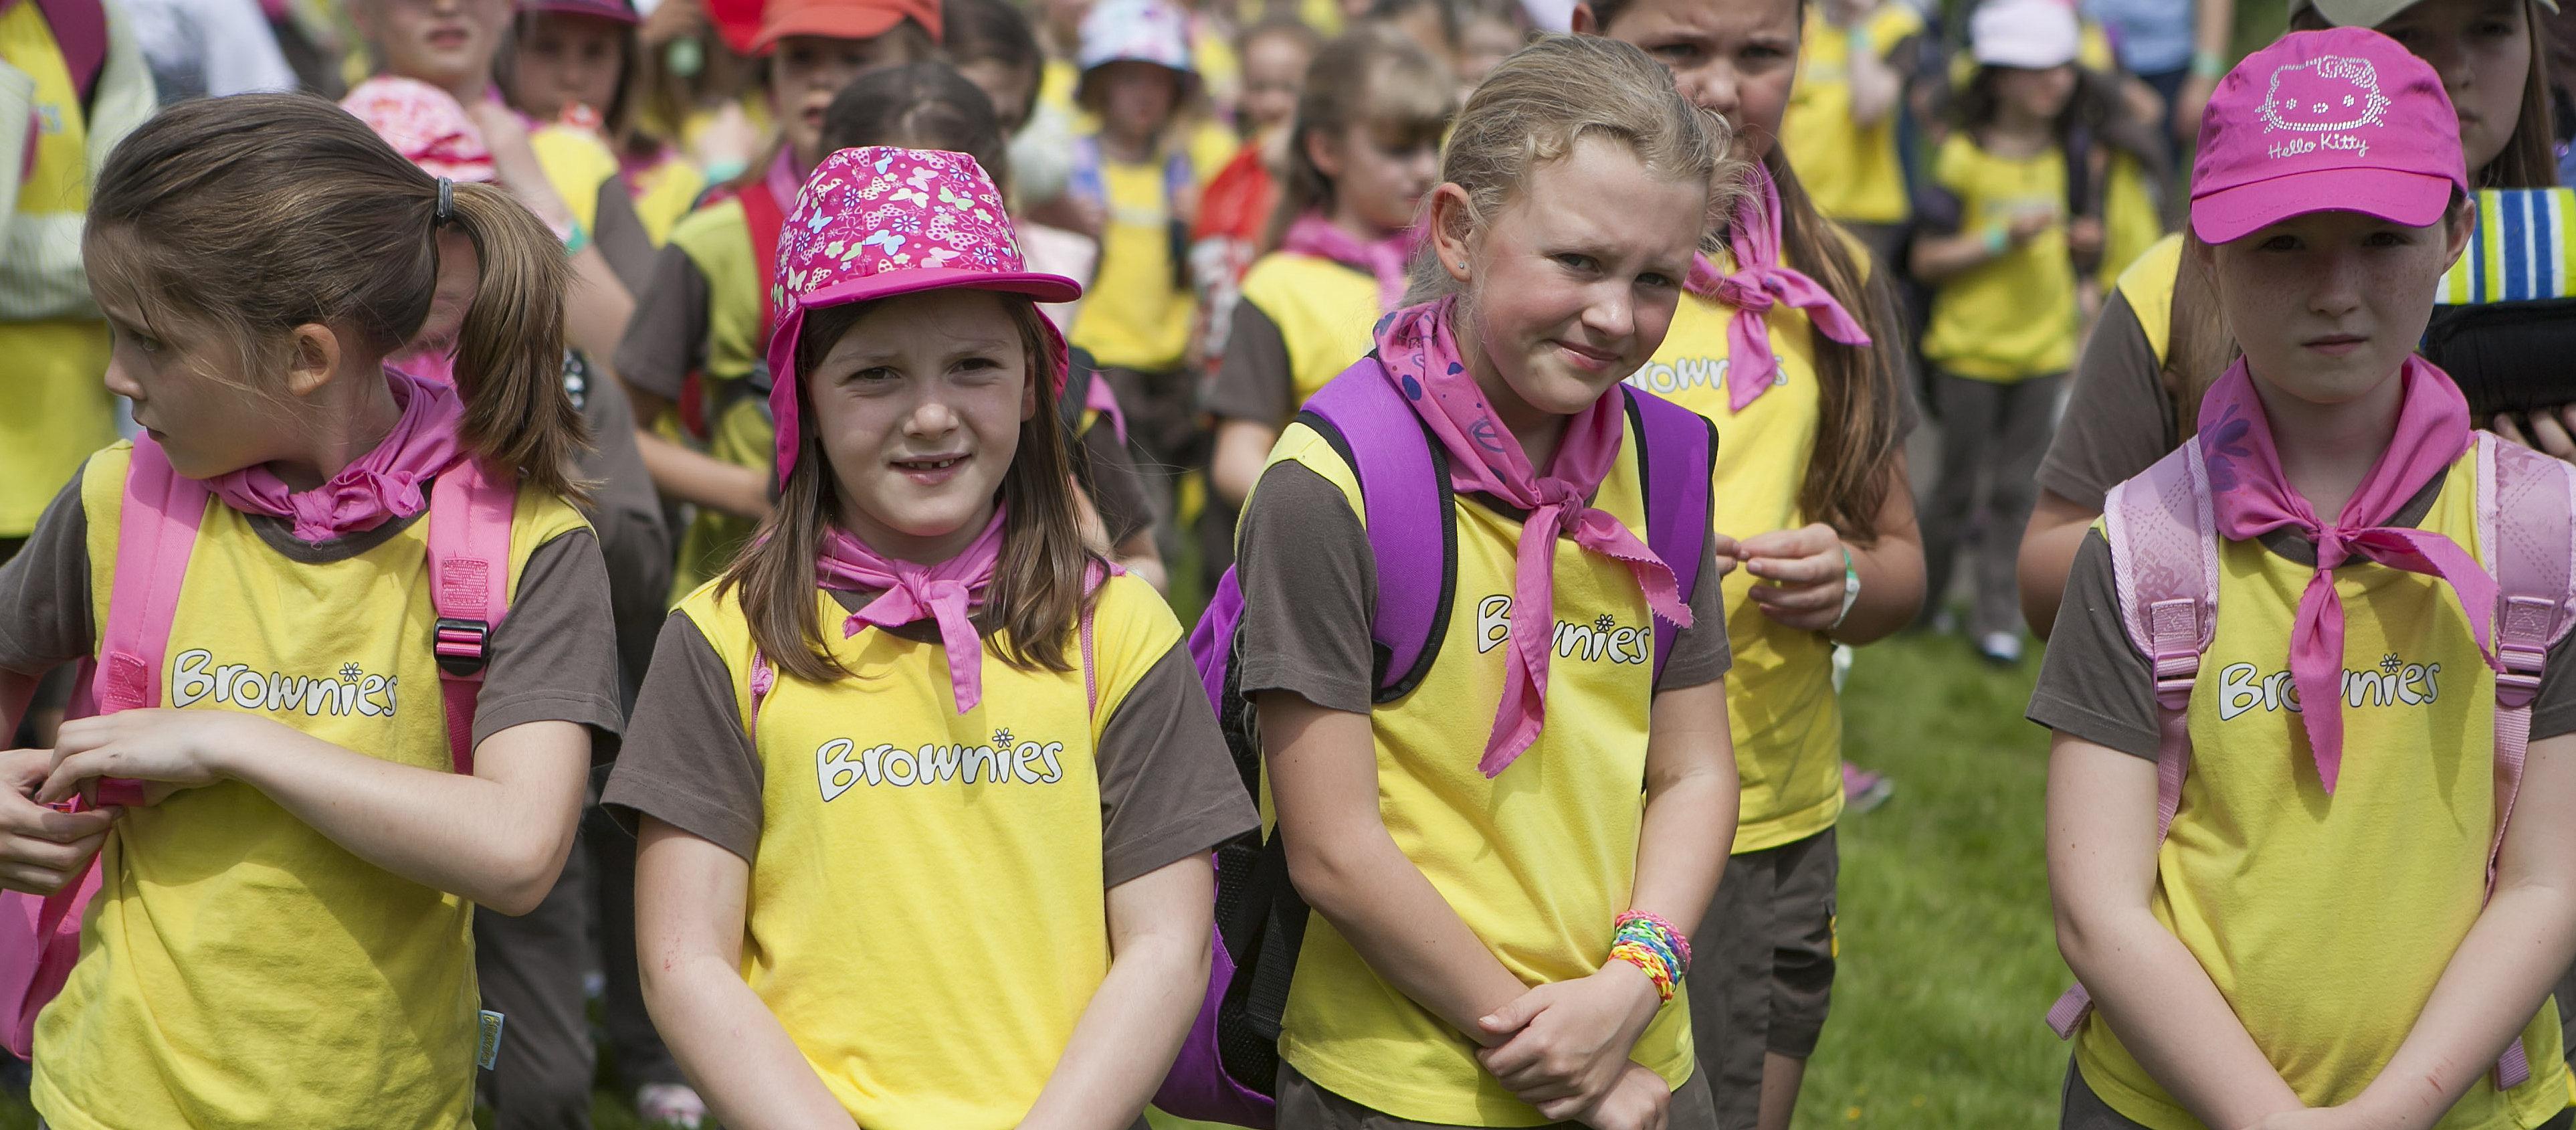 A photo of Girlguiding U.K. members. (Photo: Shutterstock/Elena Rostunova)